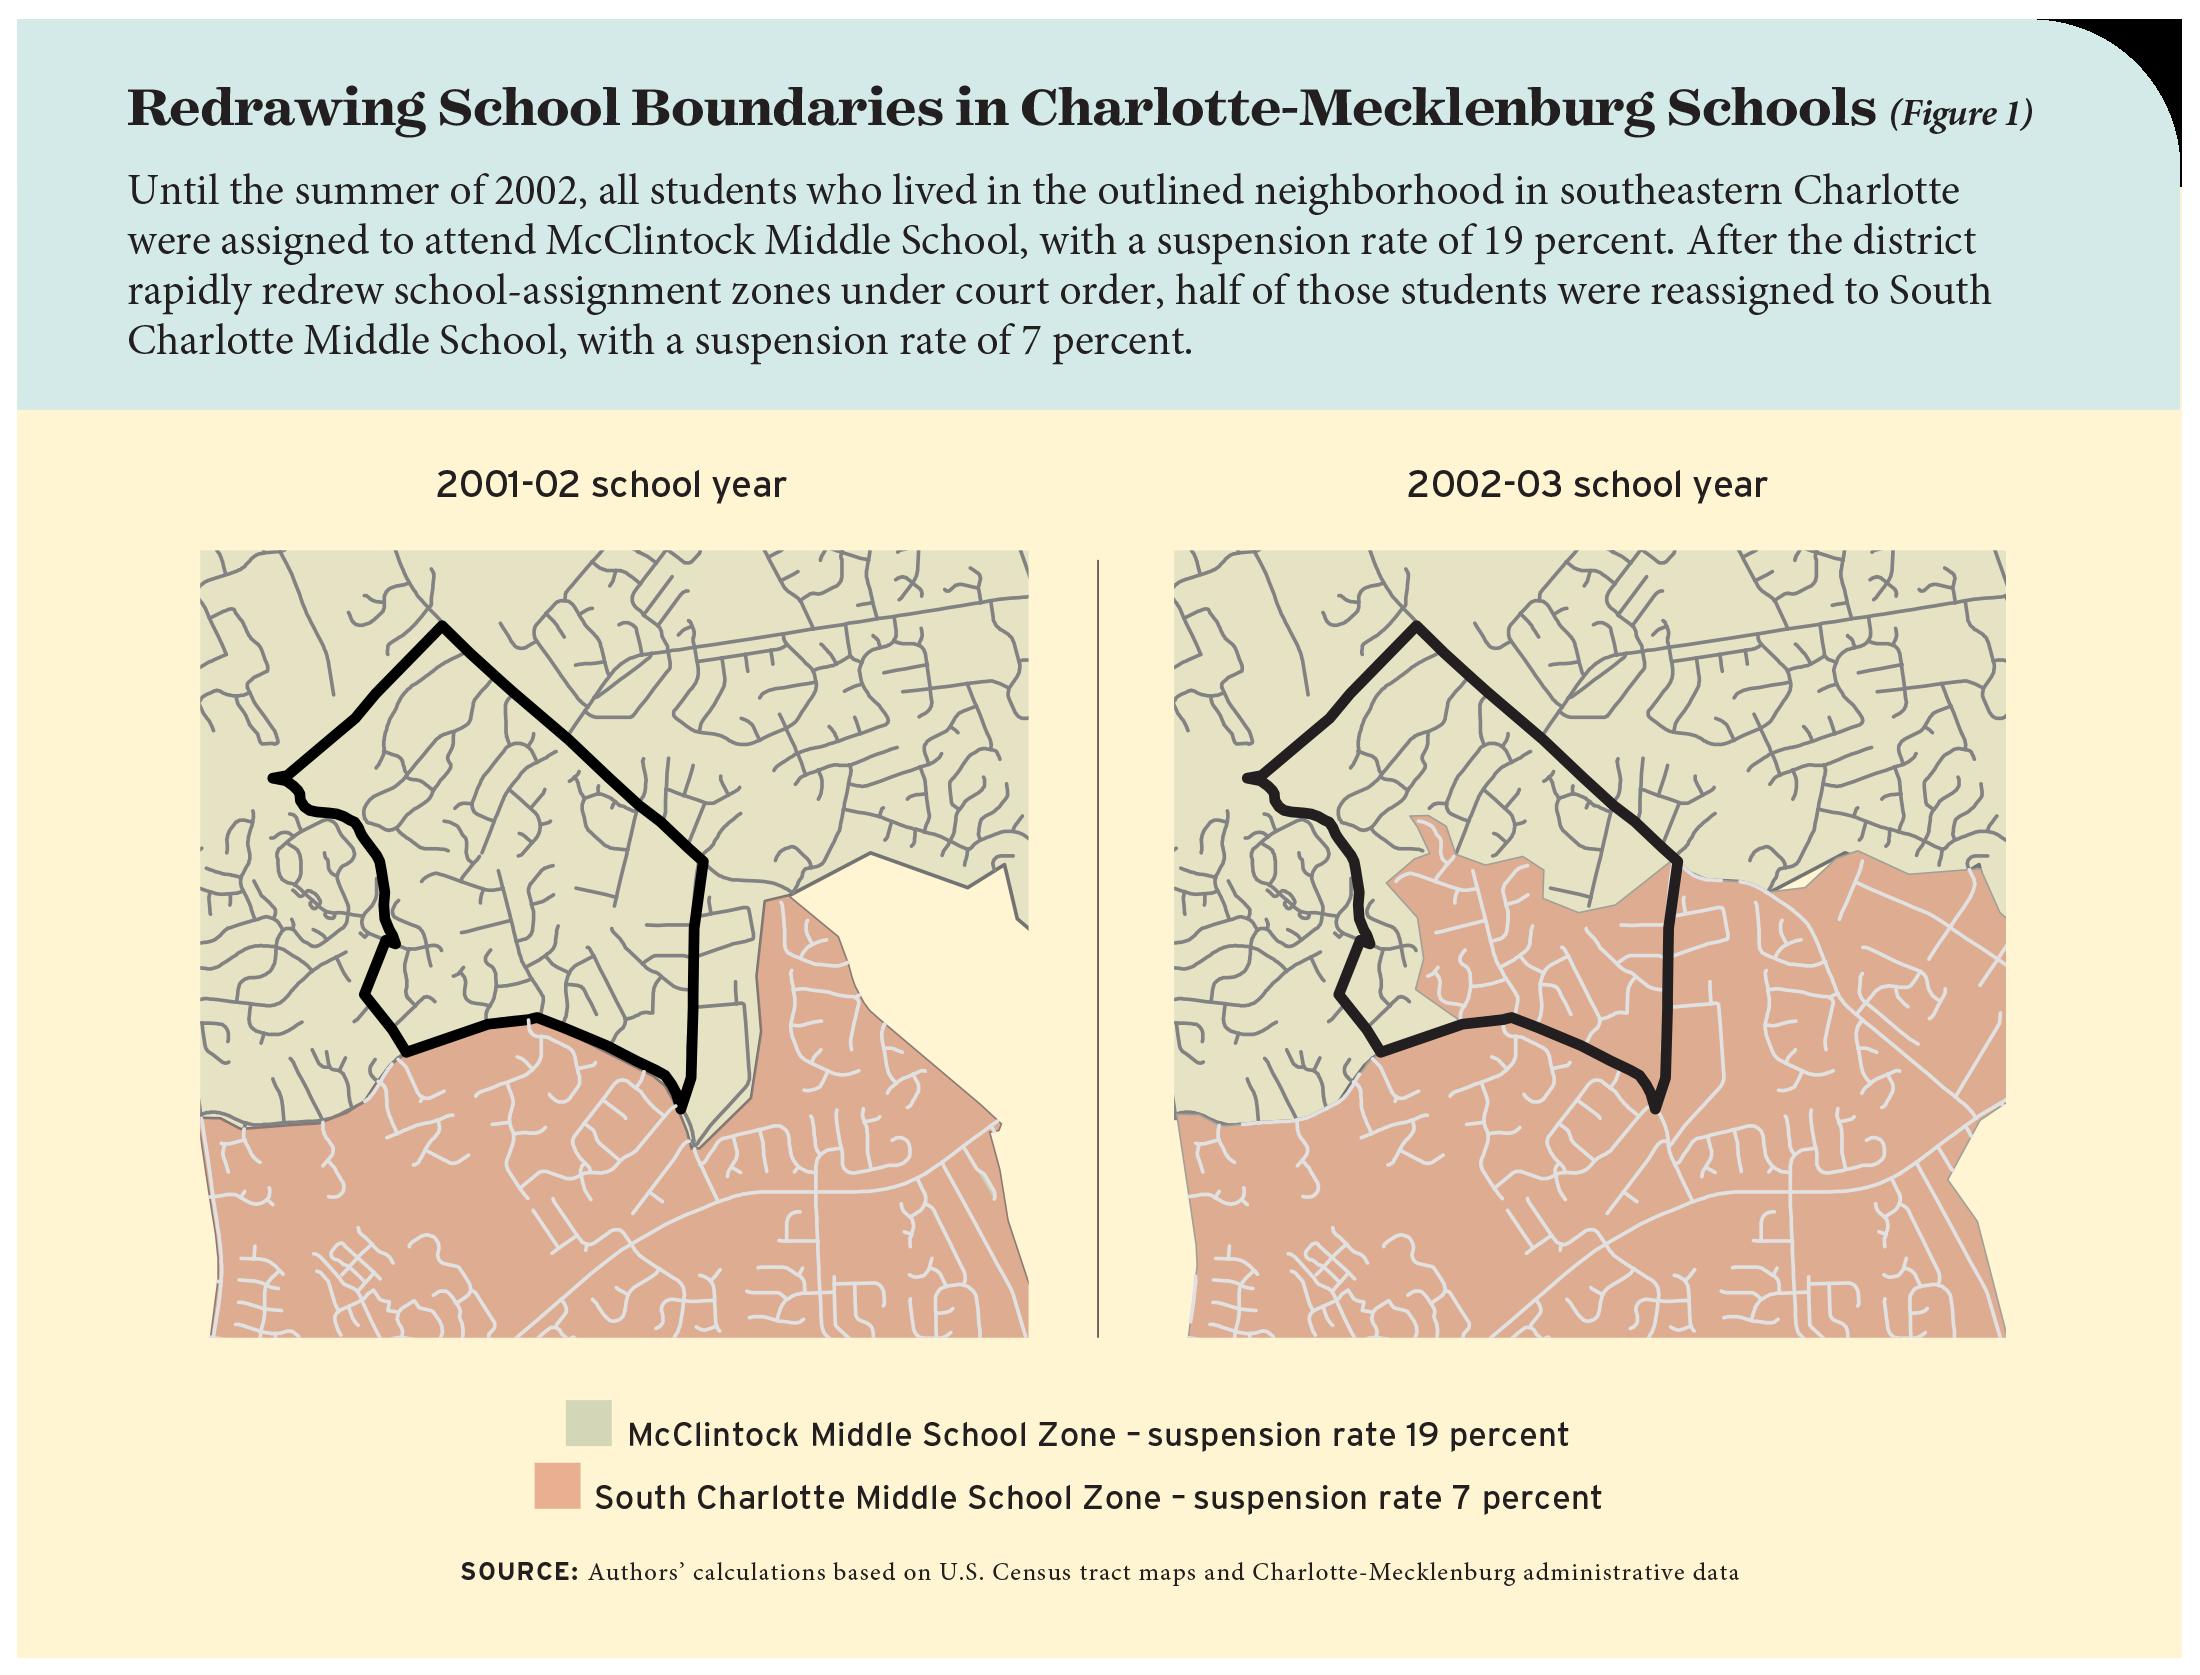 Figure 1: Redrawing School Boundaries in Charlotte-Mecklenburg Schools